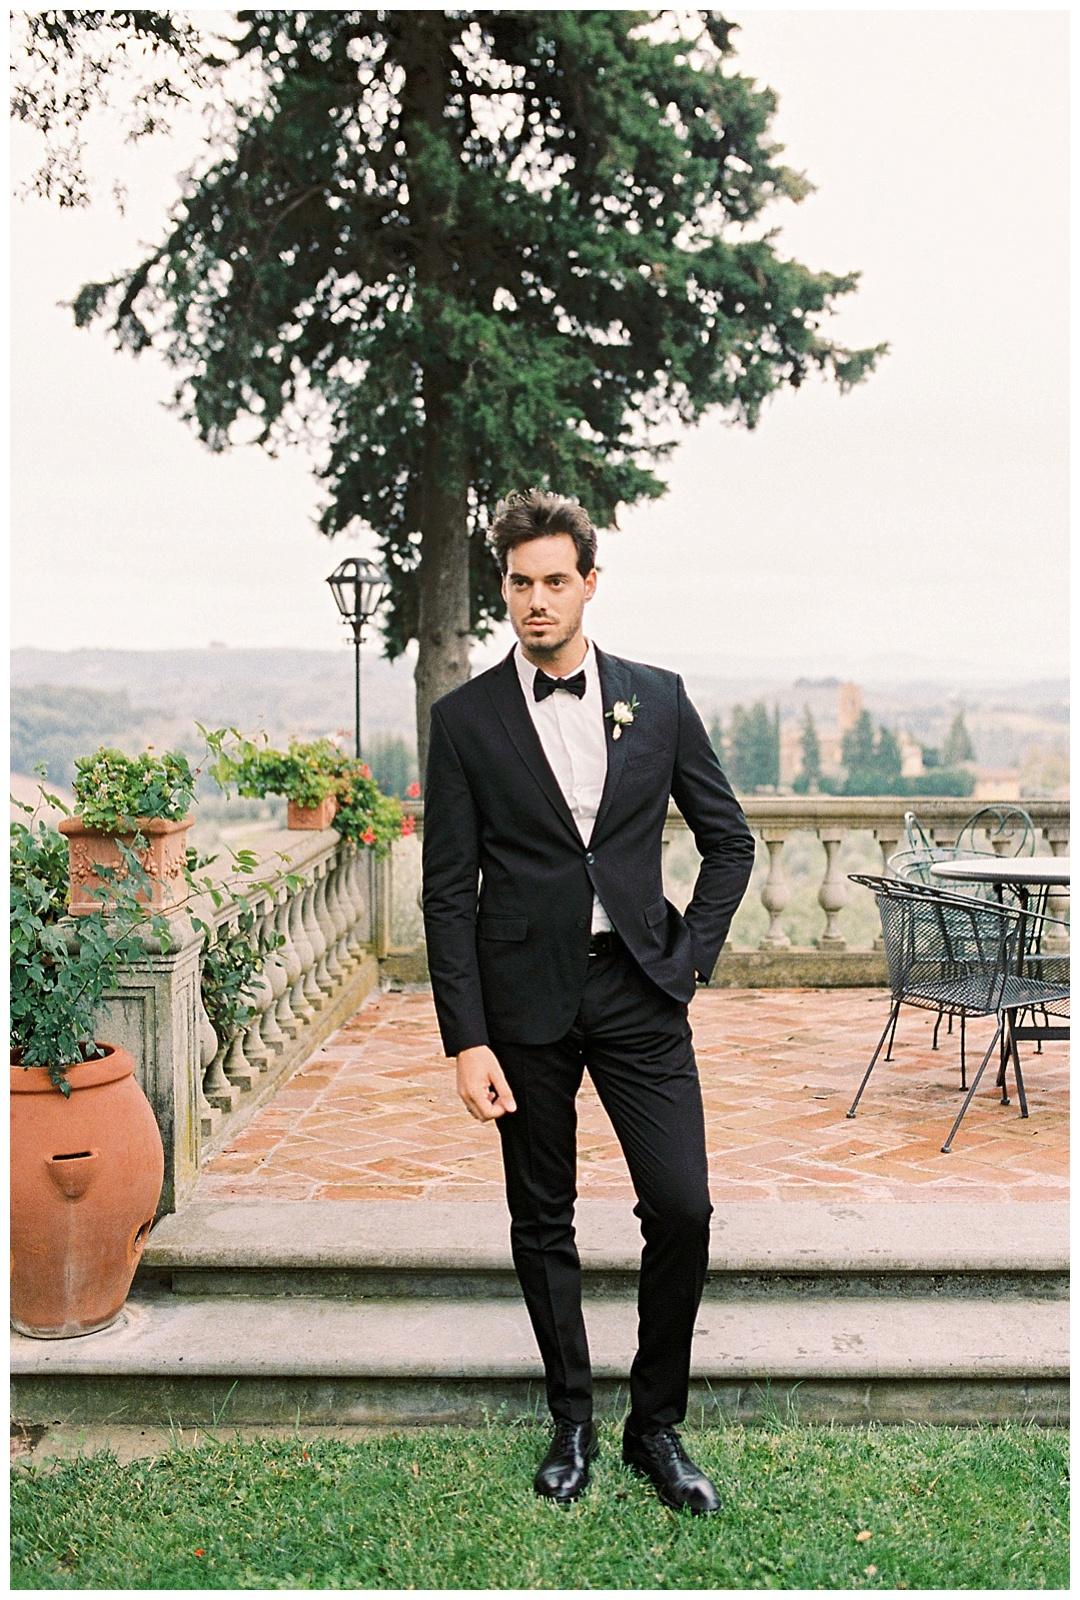 We_Can _Be_Heroes_alternative_wedding_photographer_Tuscany_wedding_film_0031